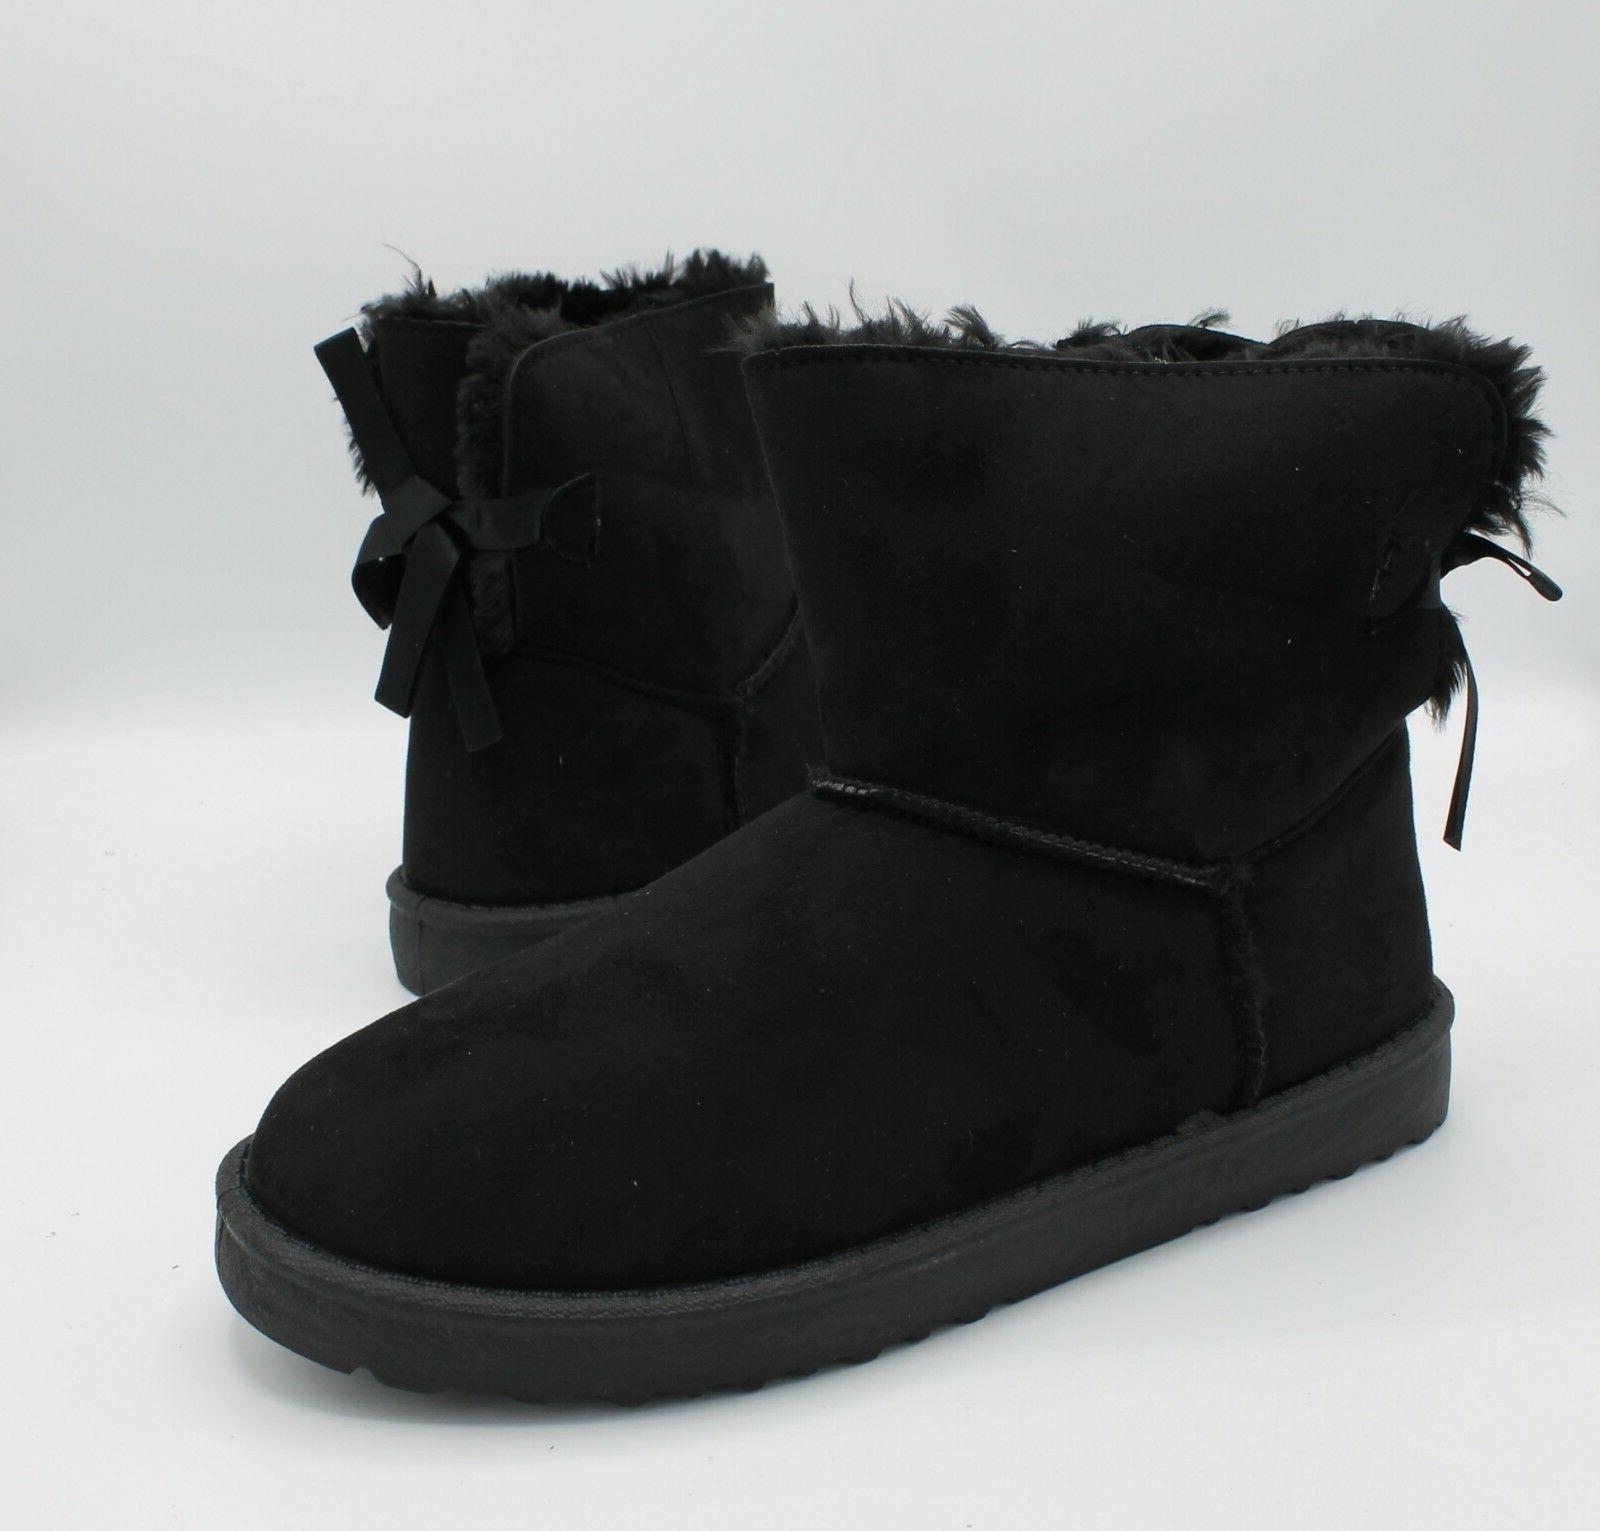 Boots Winter Fur Warm Hair